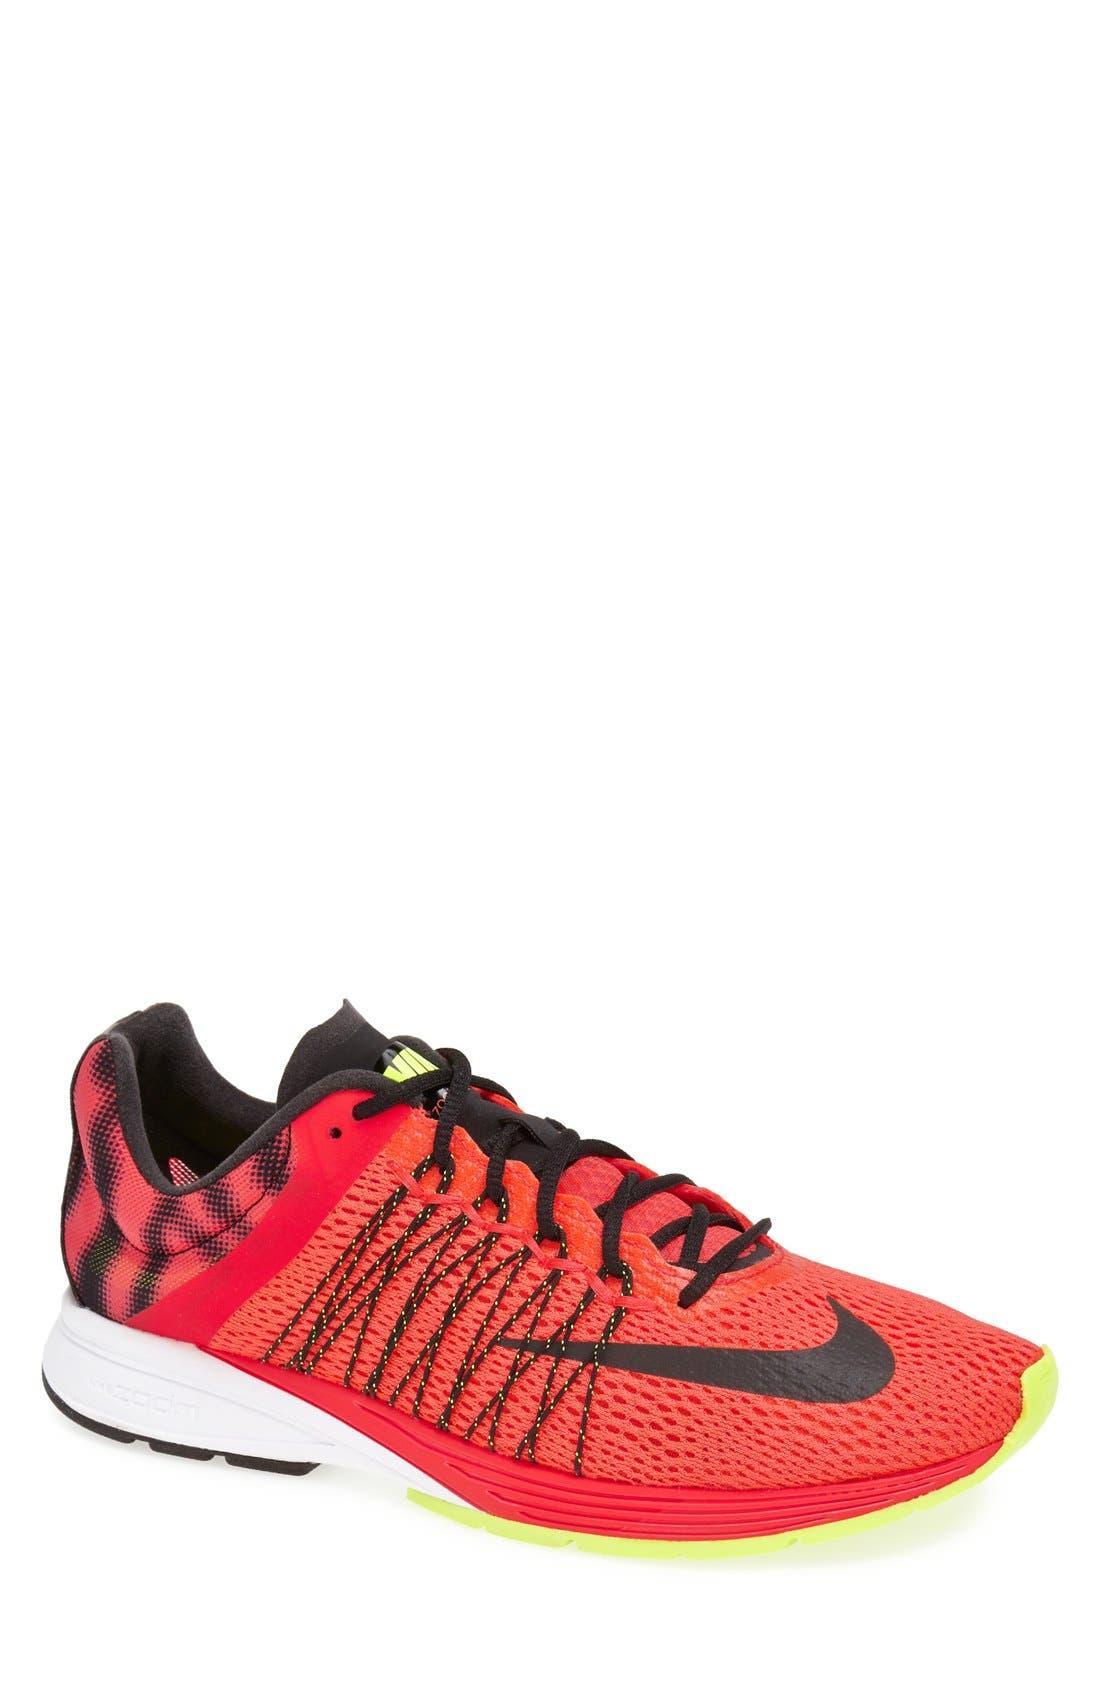 Main Image - Nike 'Zoom Streak 5' Running Shoe (Men)